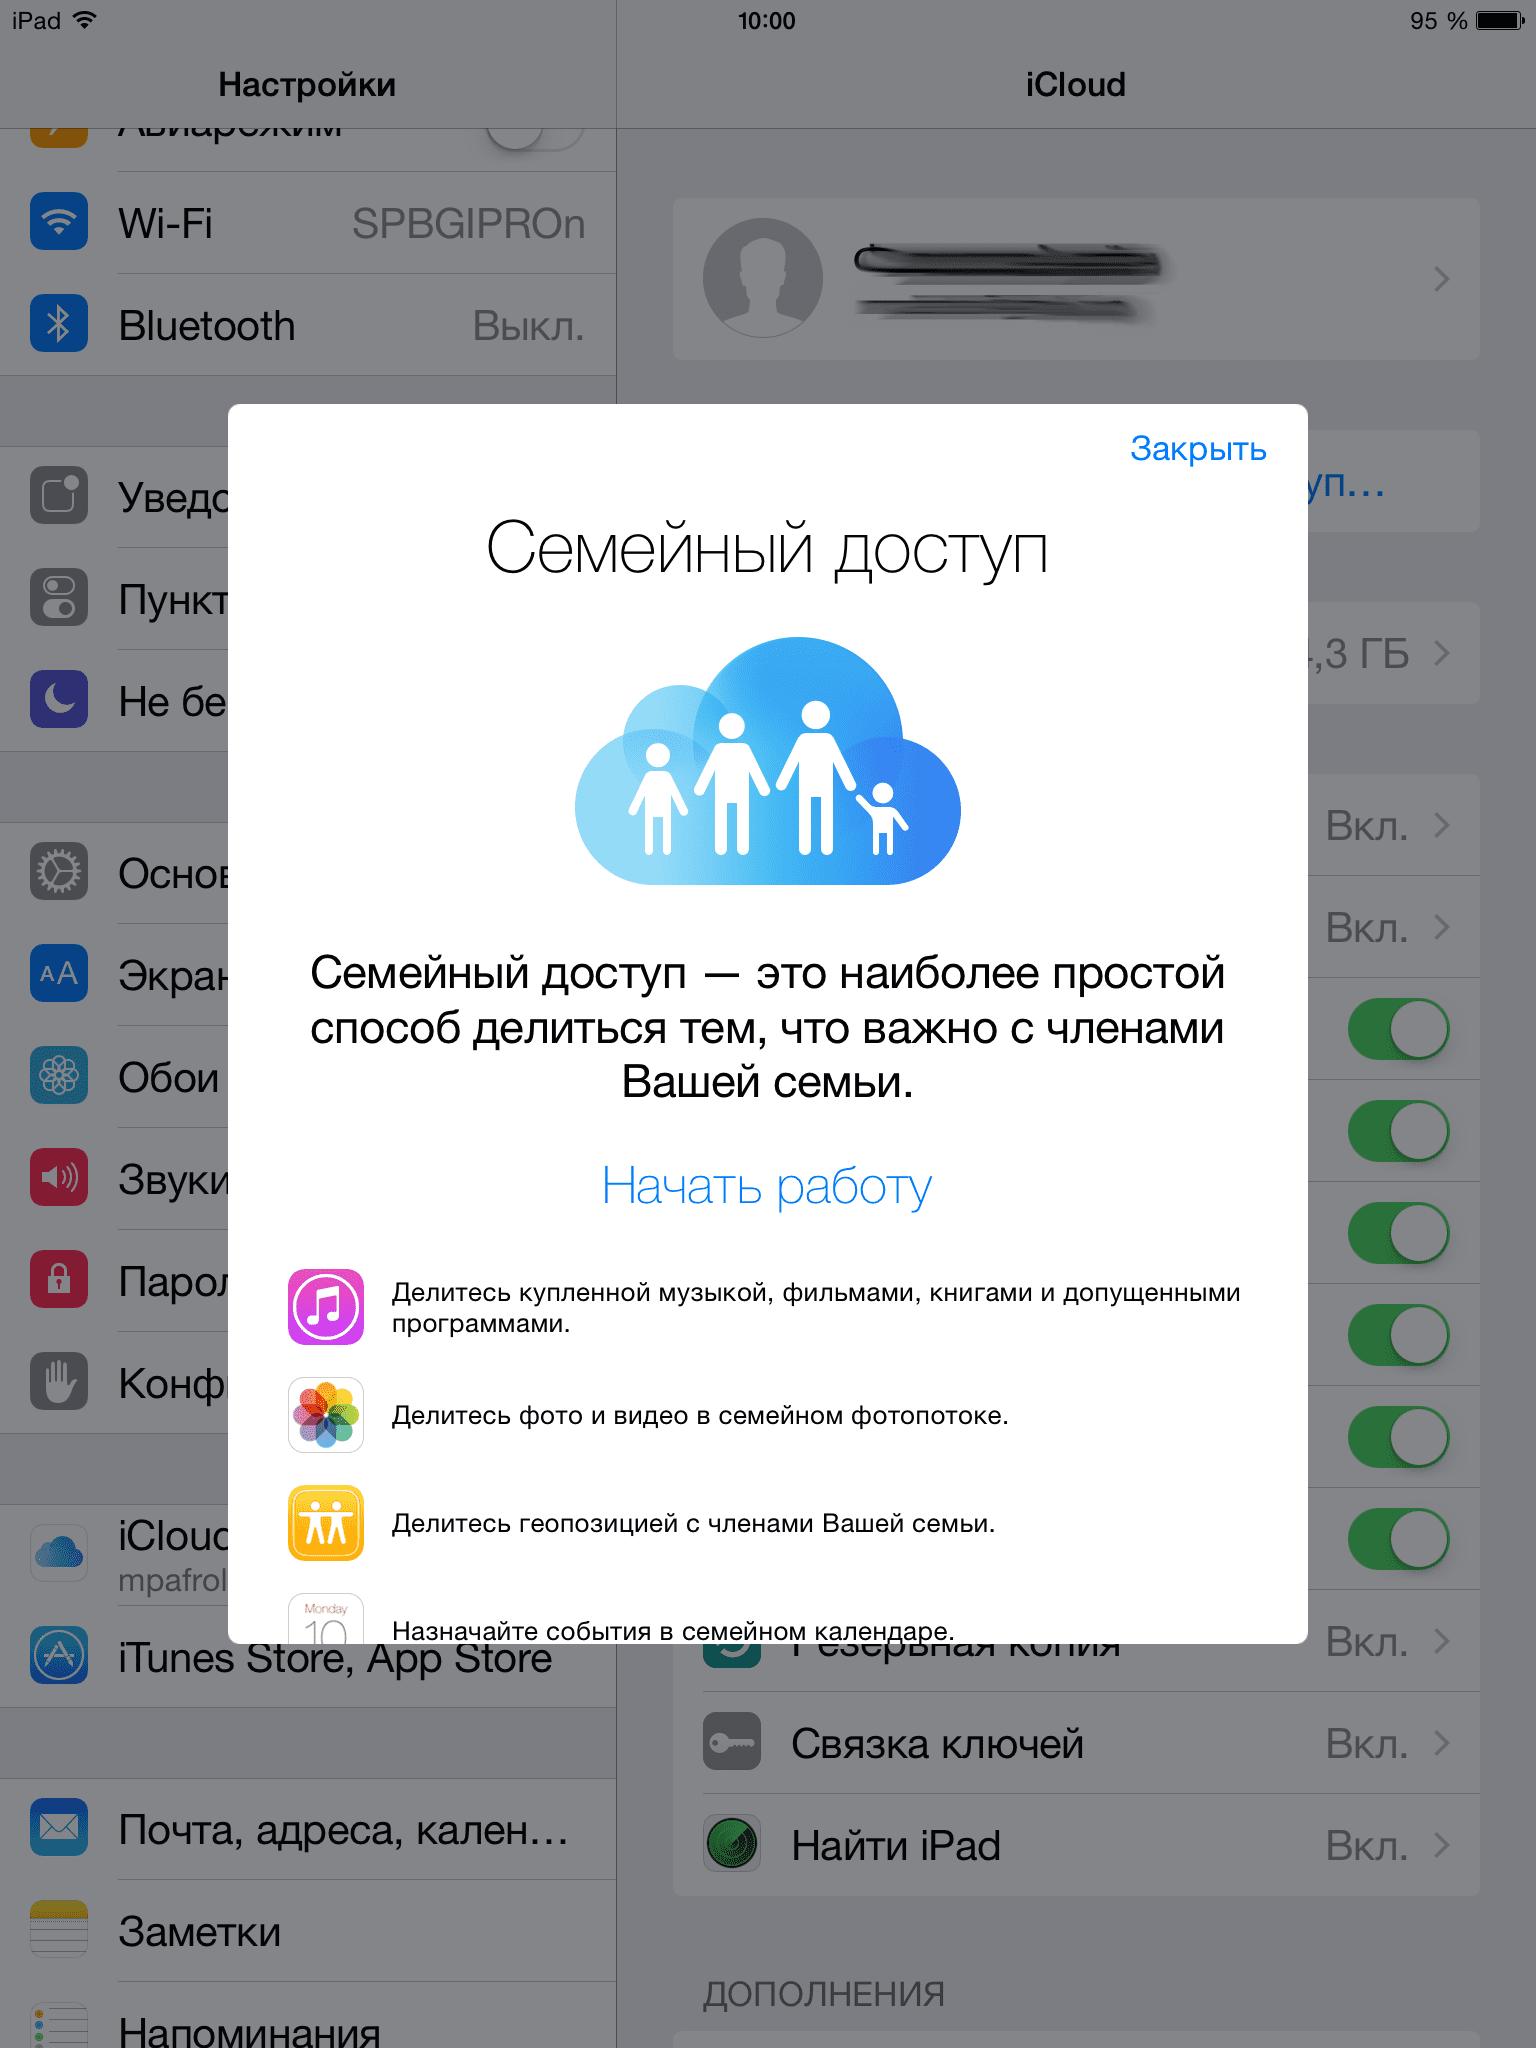 Семейный доступ (Family Sharing)